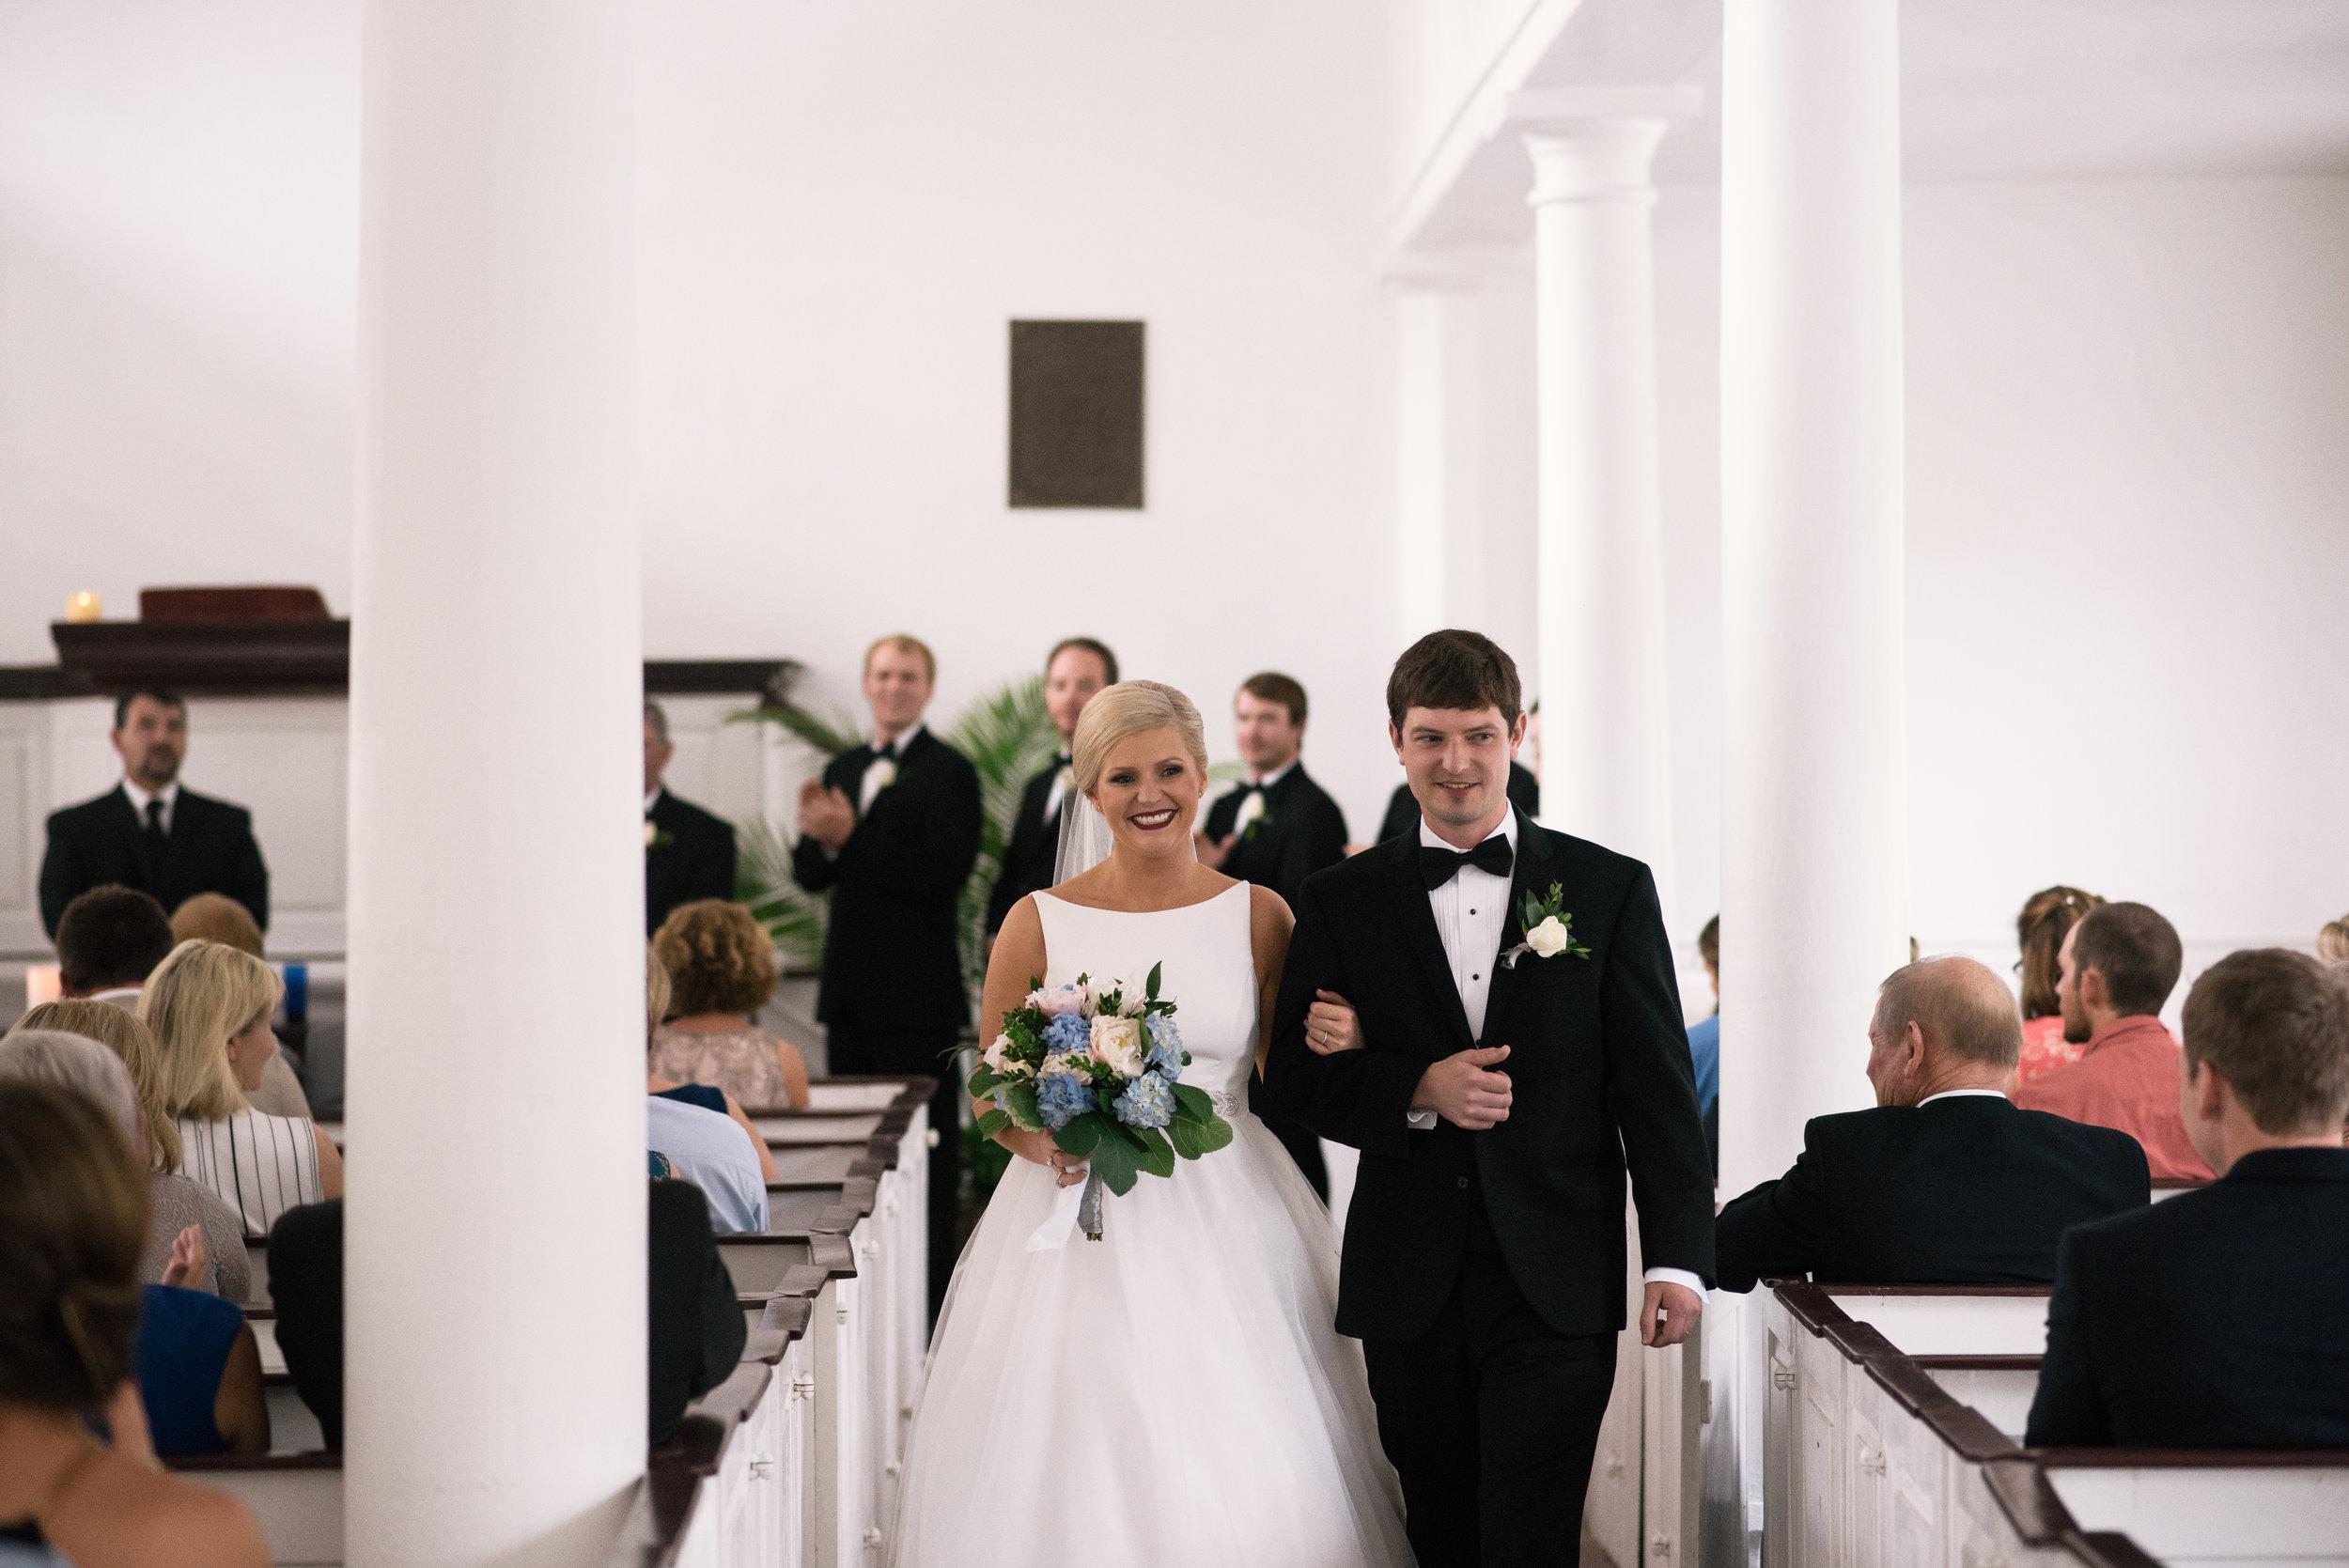 ali-and-jared-savannah-georgia-may-2017-wedding-meg-hill-photo-(336of760).jpg